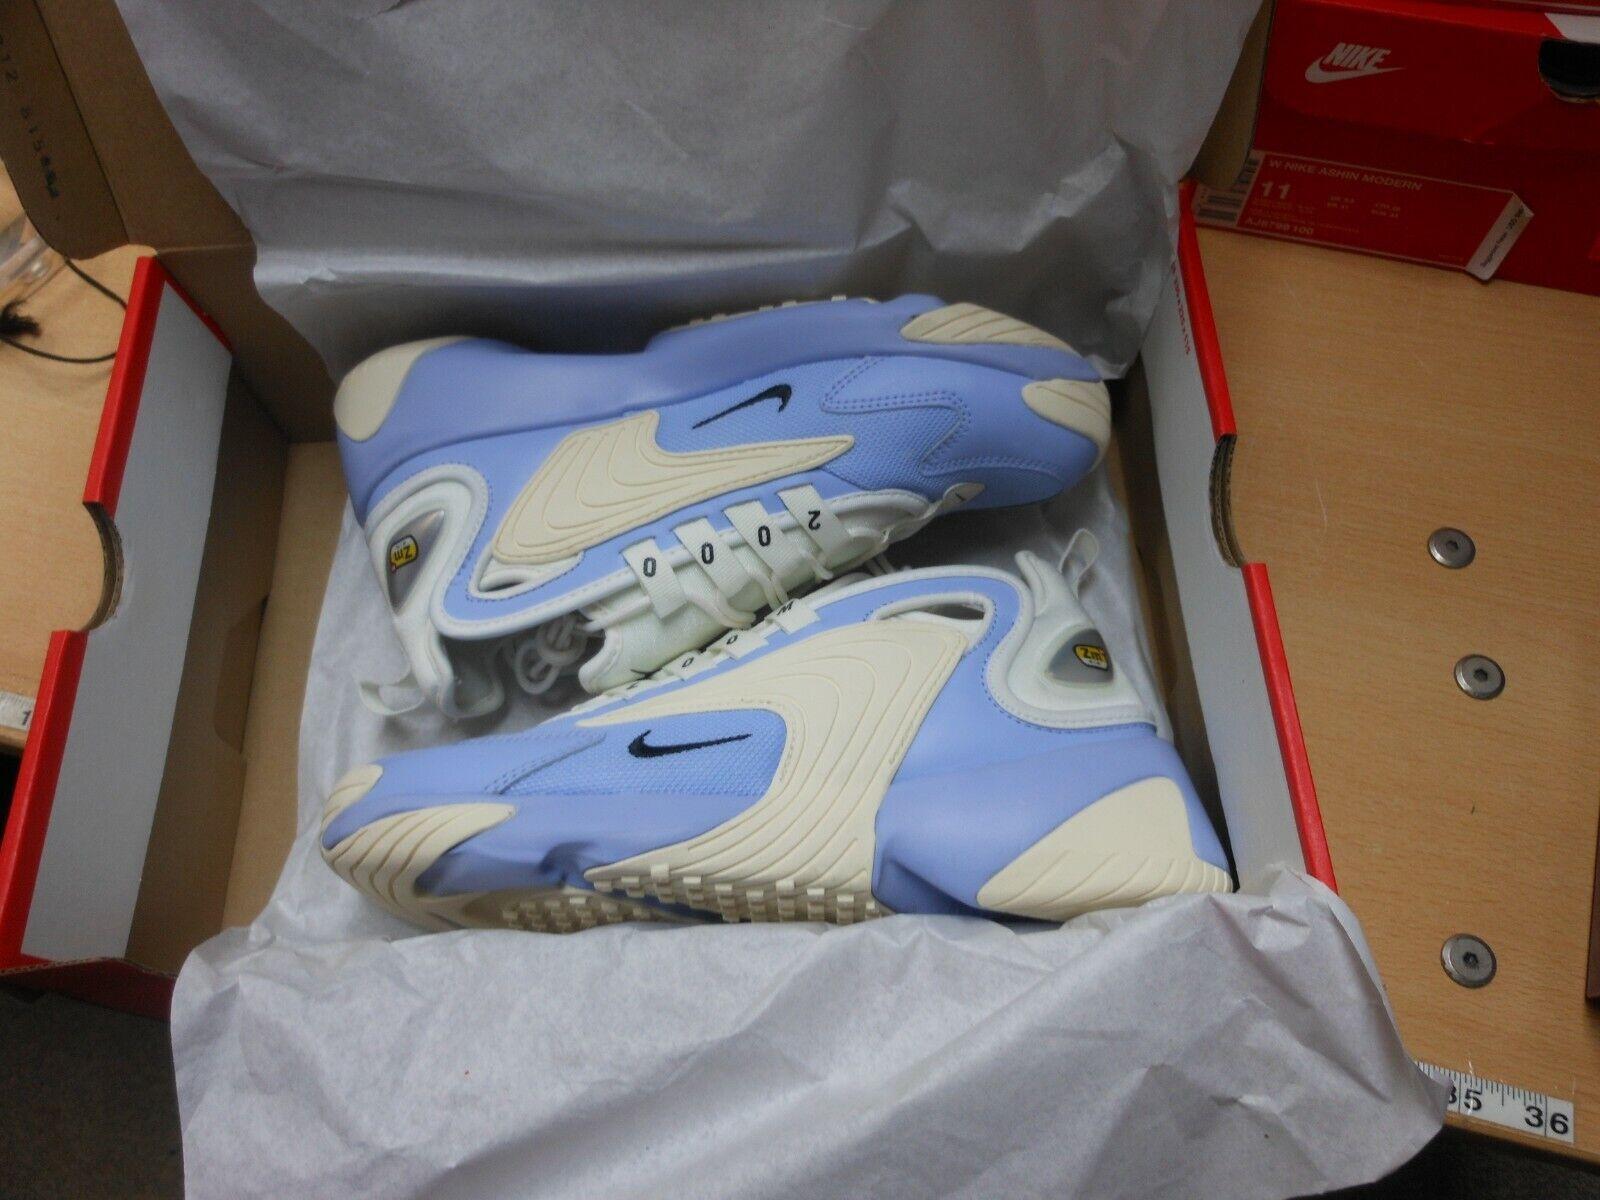 Nike sz  9 Wouomo ZOOM AIR 2K CASUAL scarpe da ginnastica   Scarpe NUOVE AO0354 400 w argento  vendite online